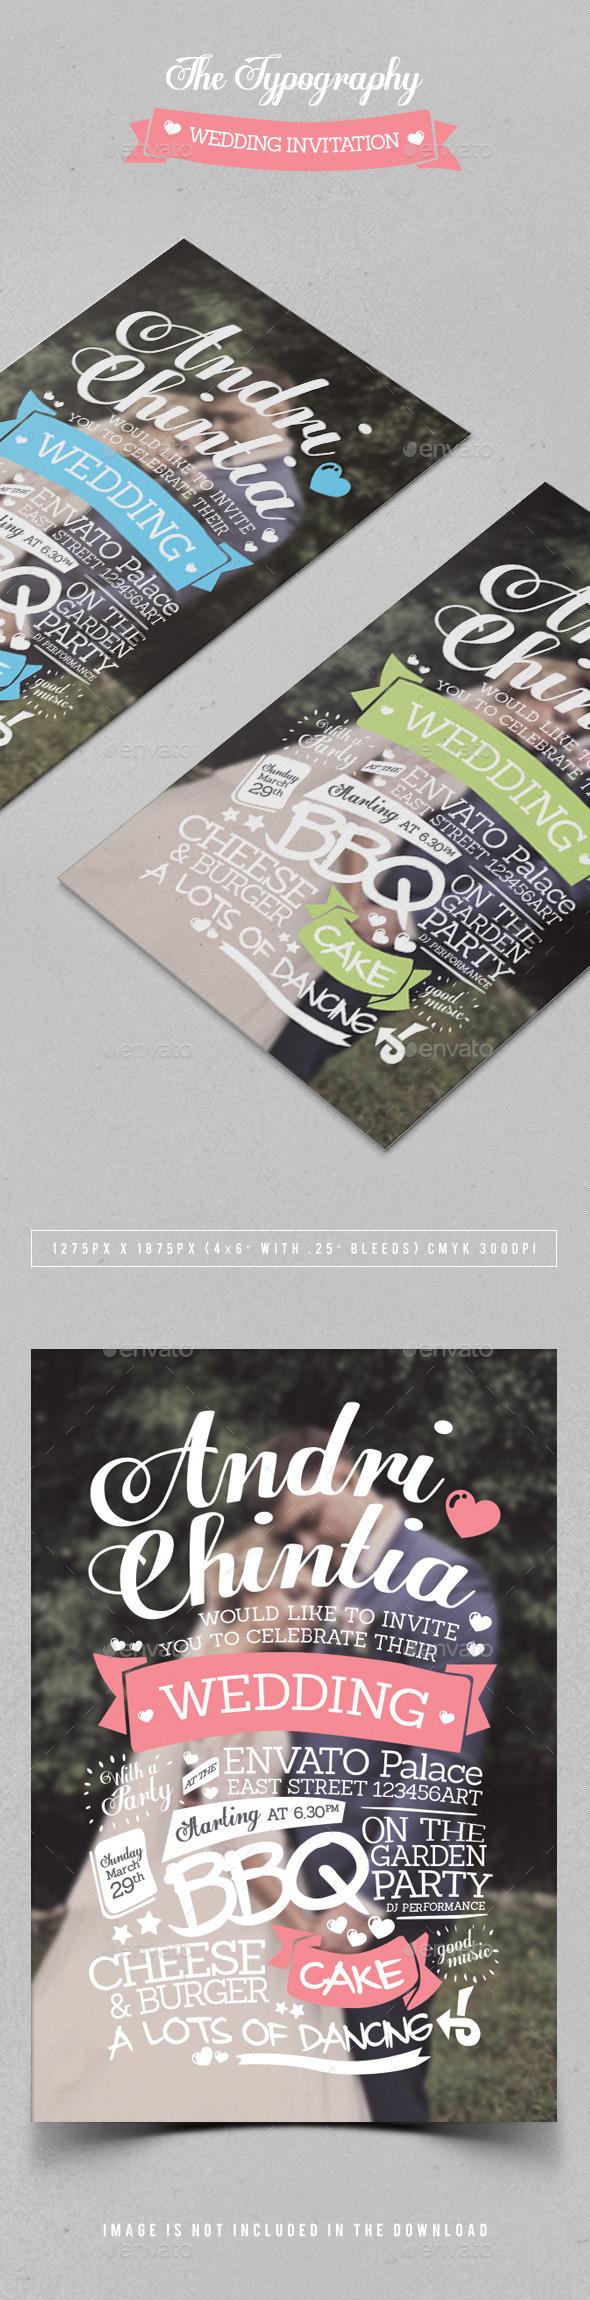 GraphicRiver The Typography Wedding Invitation 10677492